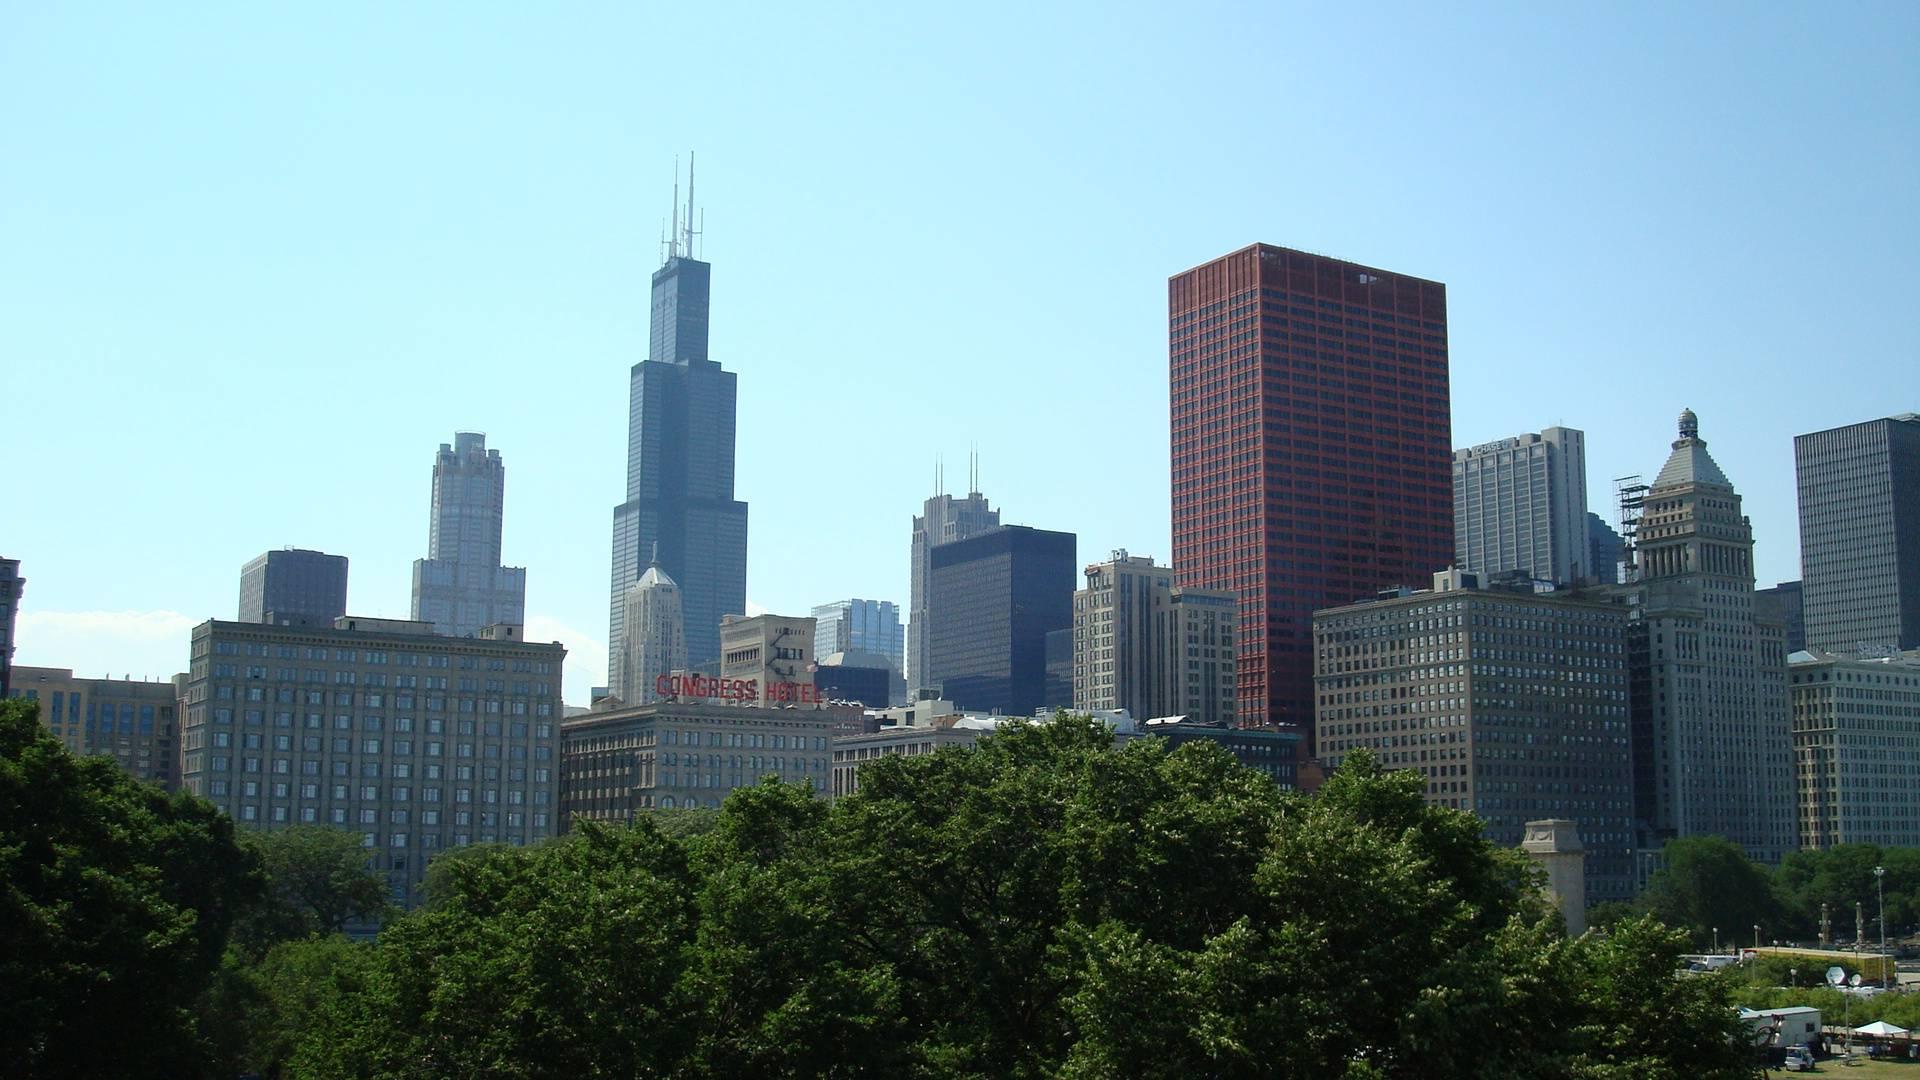 Chicago screensavers and wallpaper wallpapersafari - Chicago skyline wallpaper 1920x1080 ...